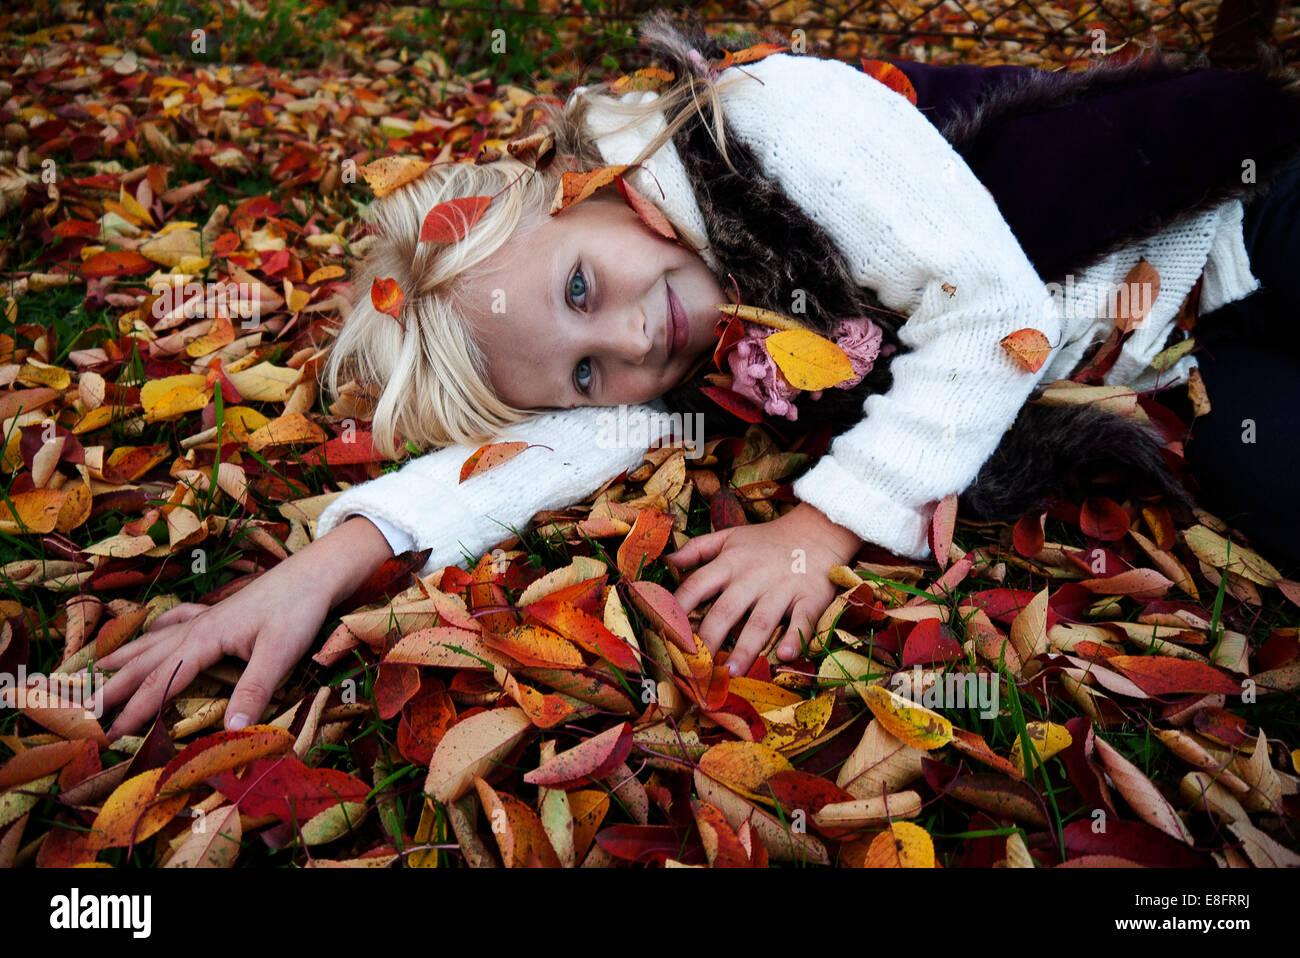 Girl (6-7) lying on autumn leaves - Stock Image